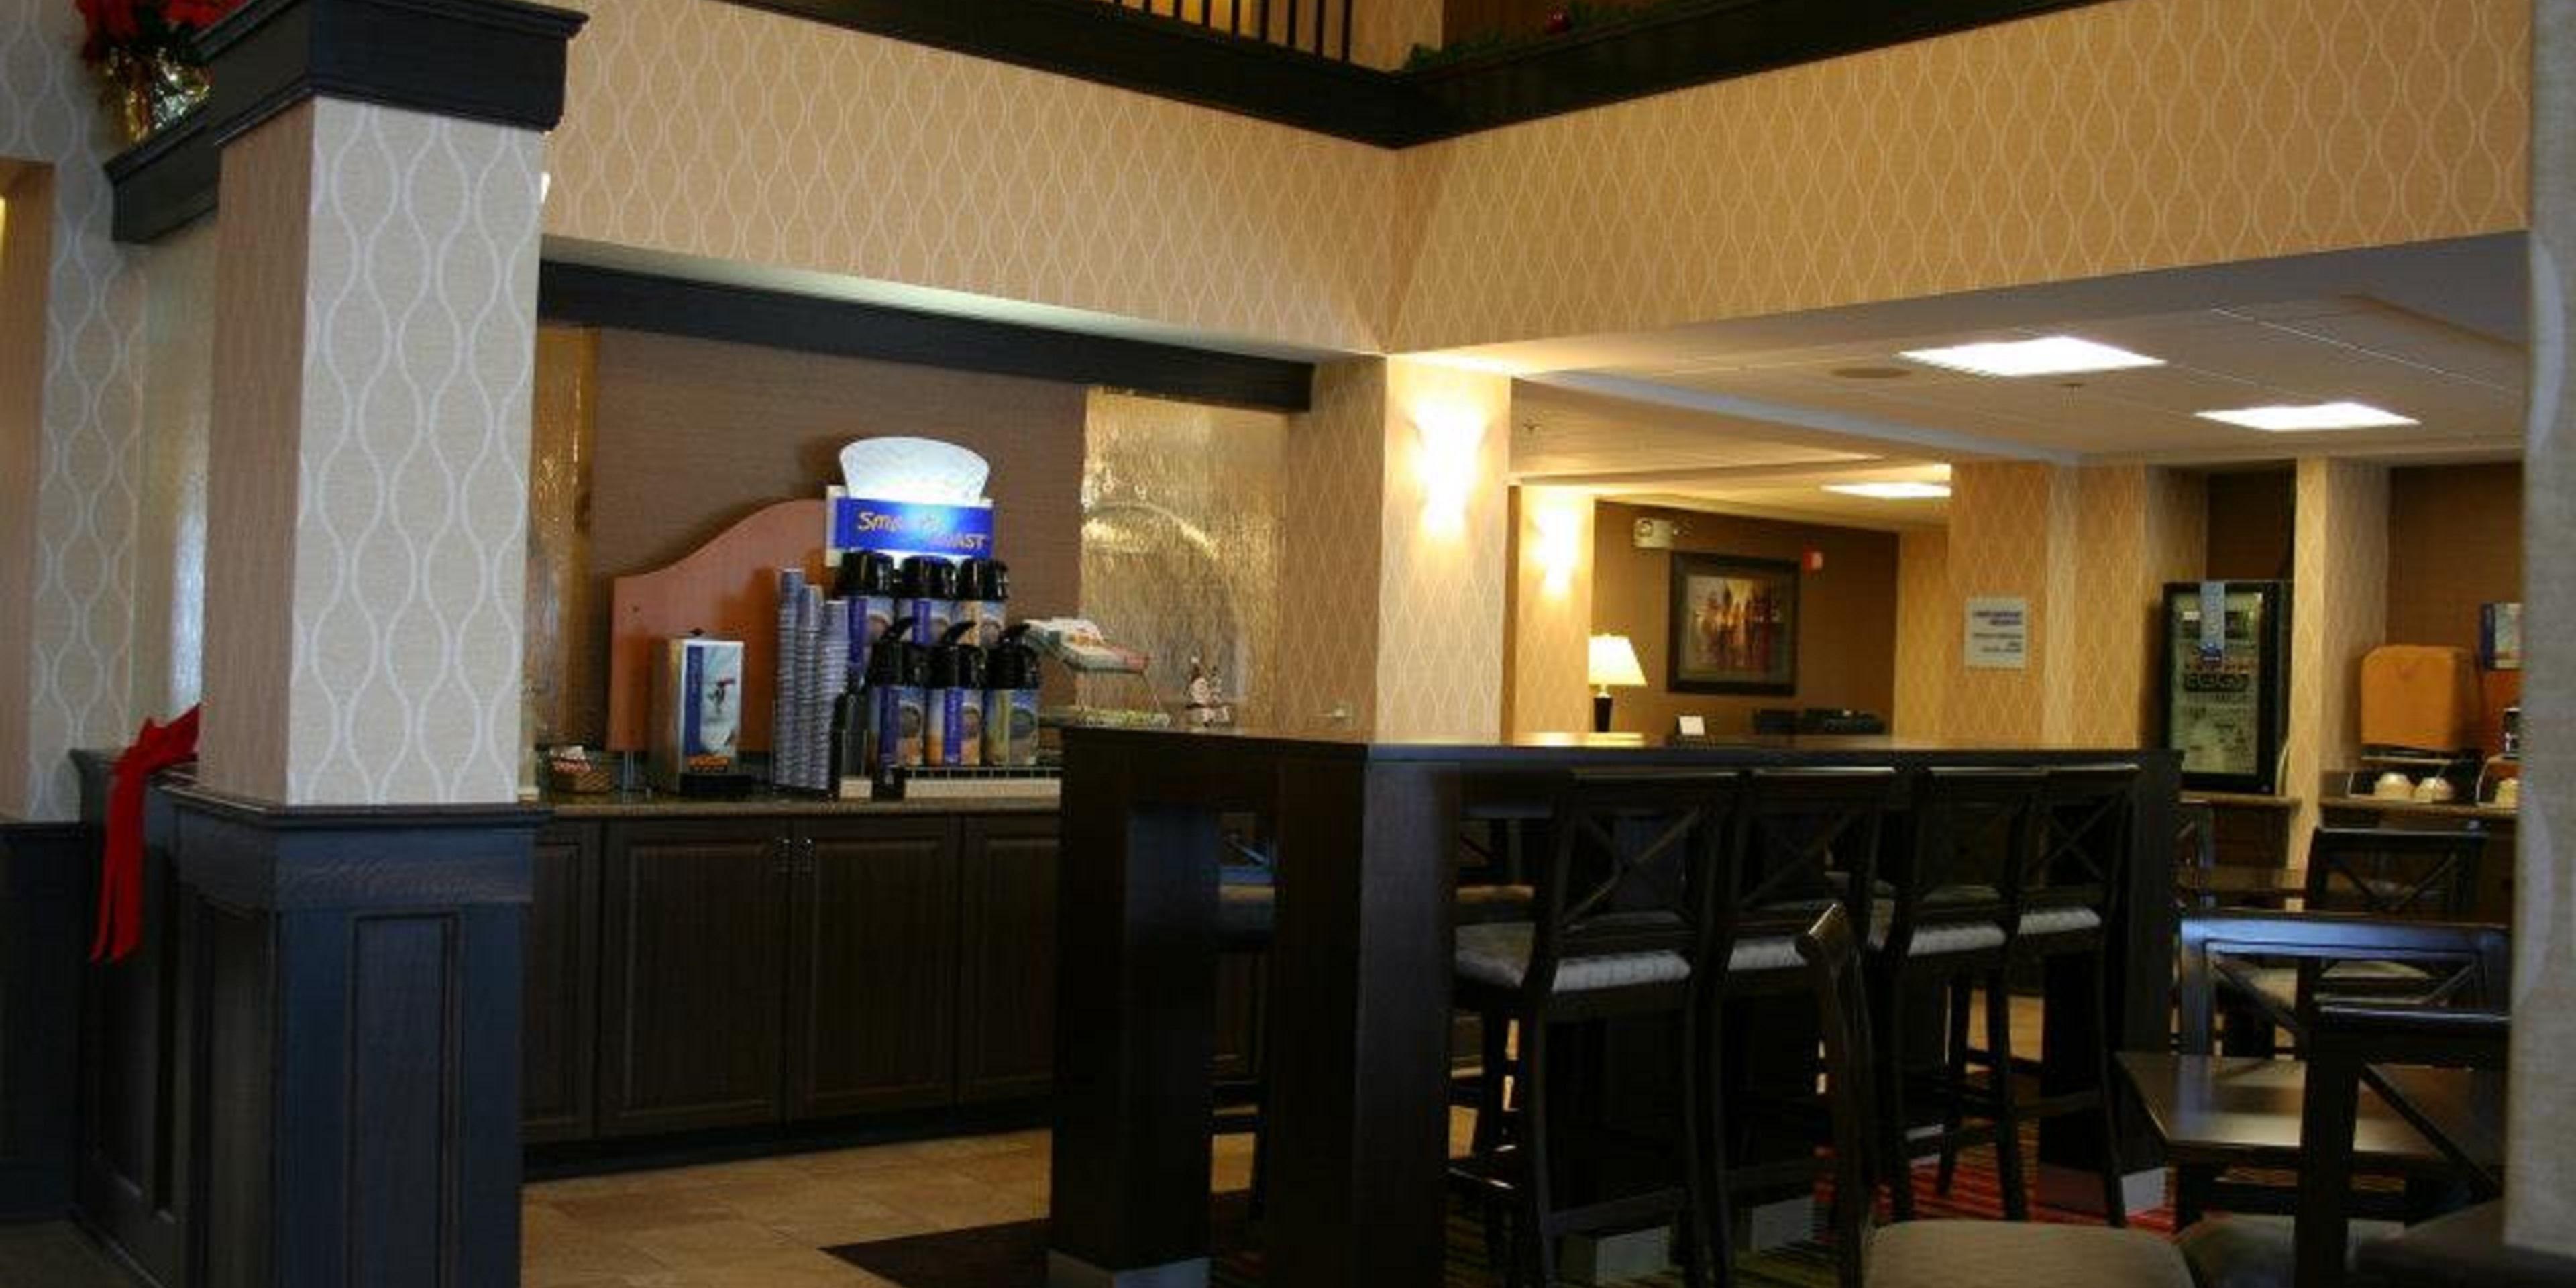 Holiday Inn Express Houghton 4429810997 2x1